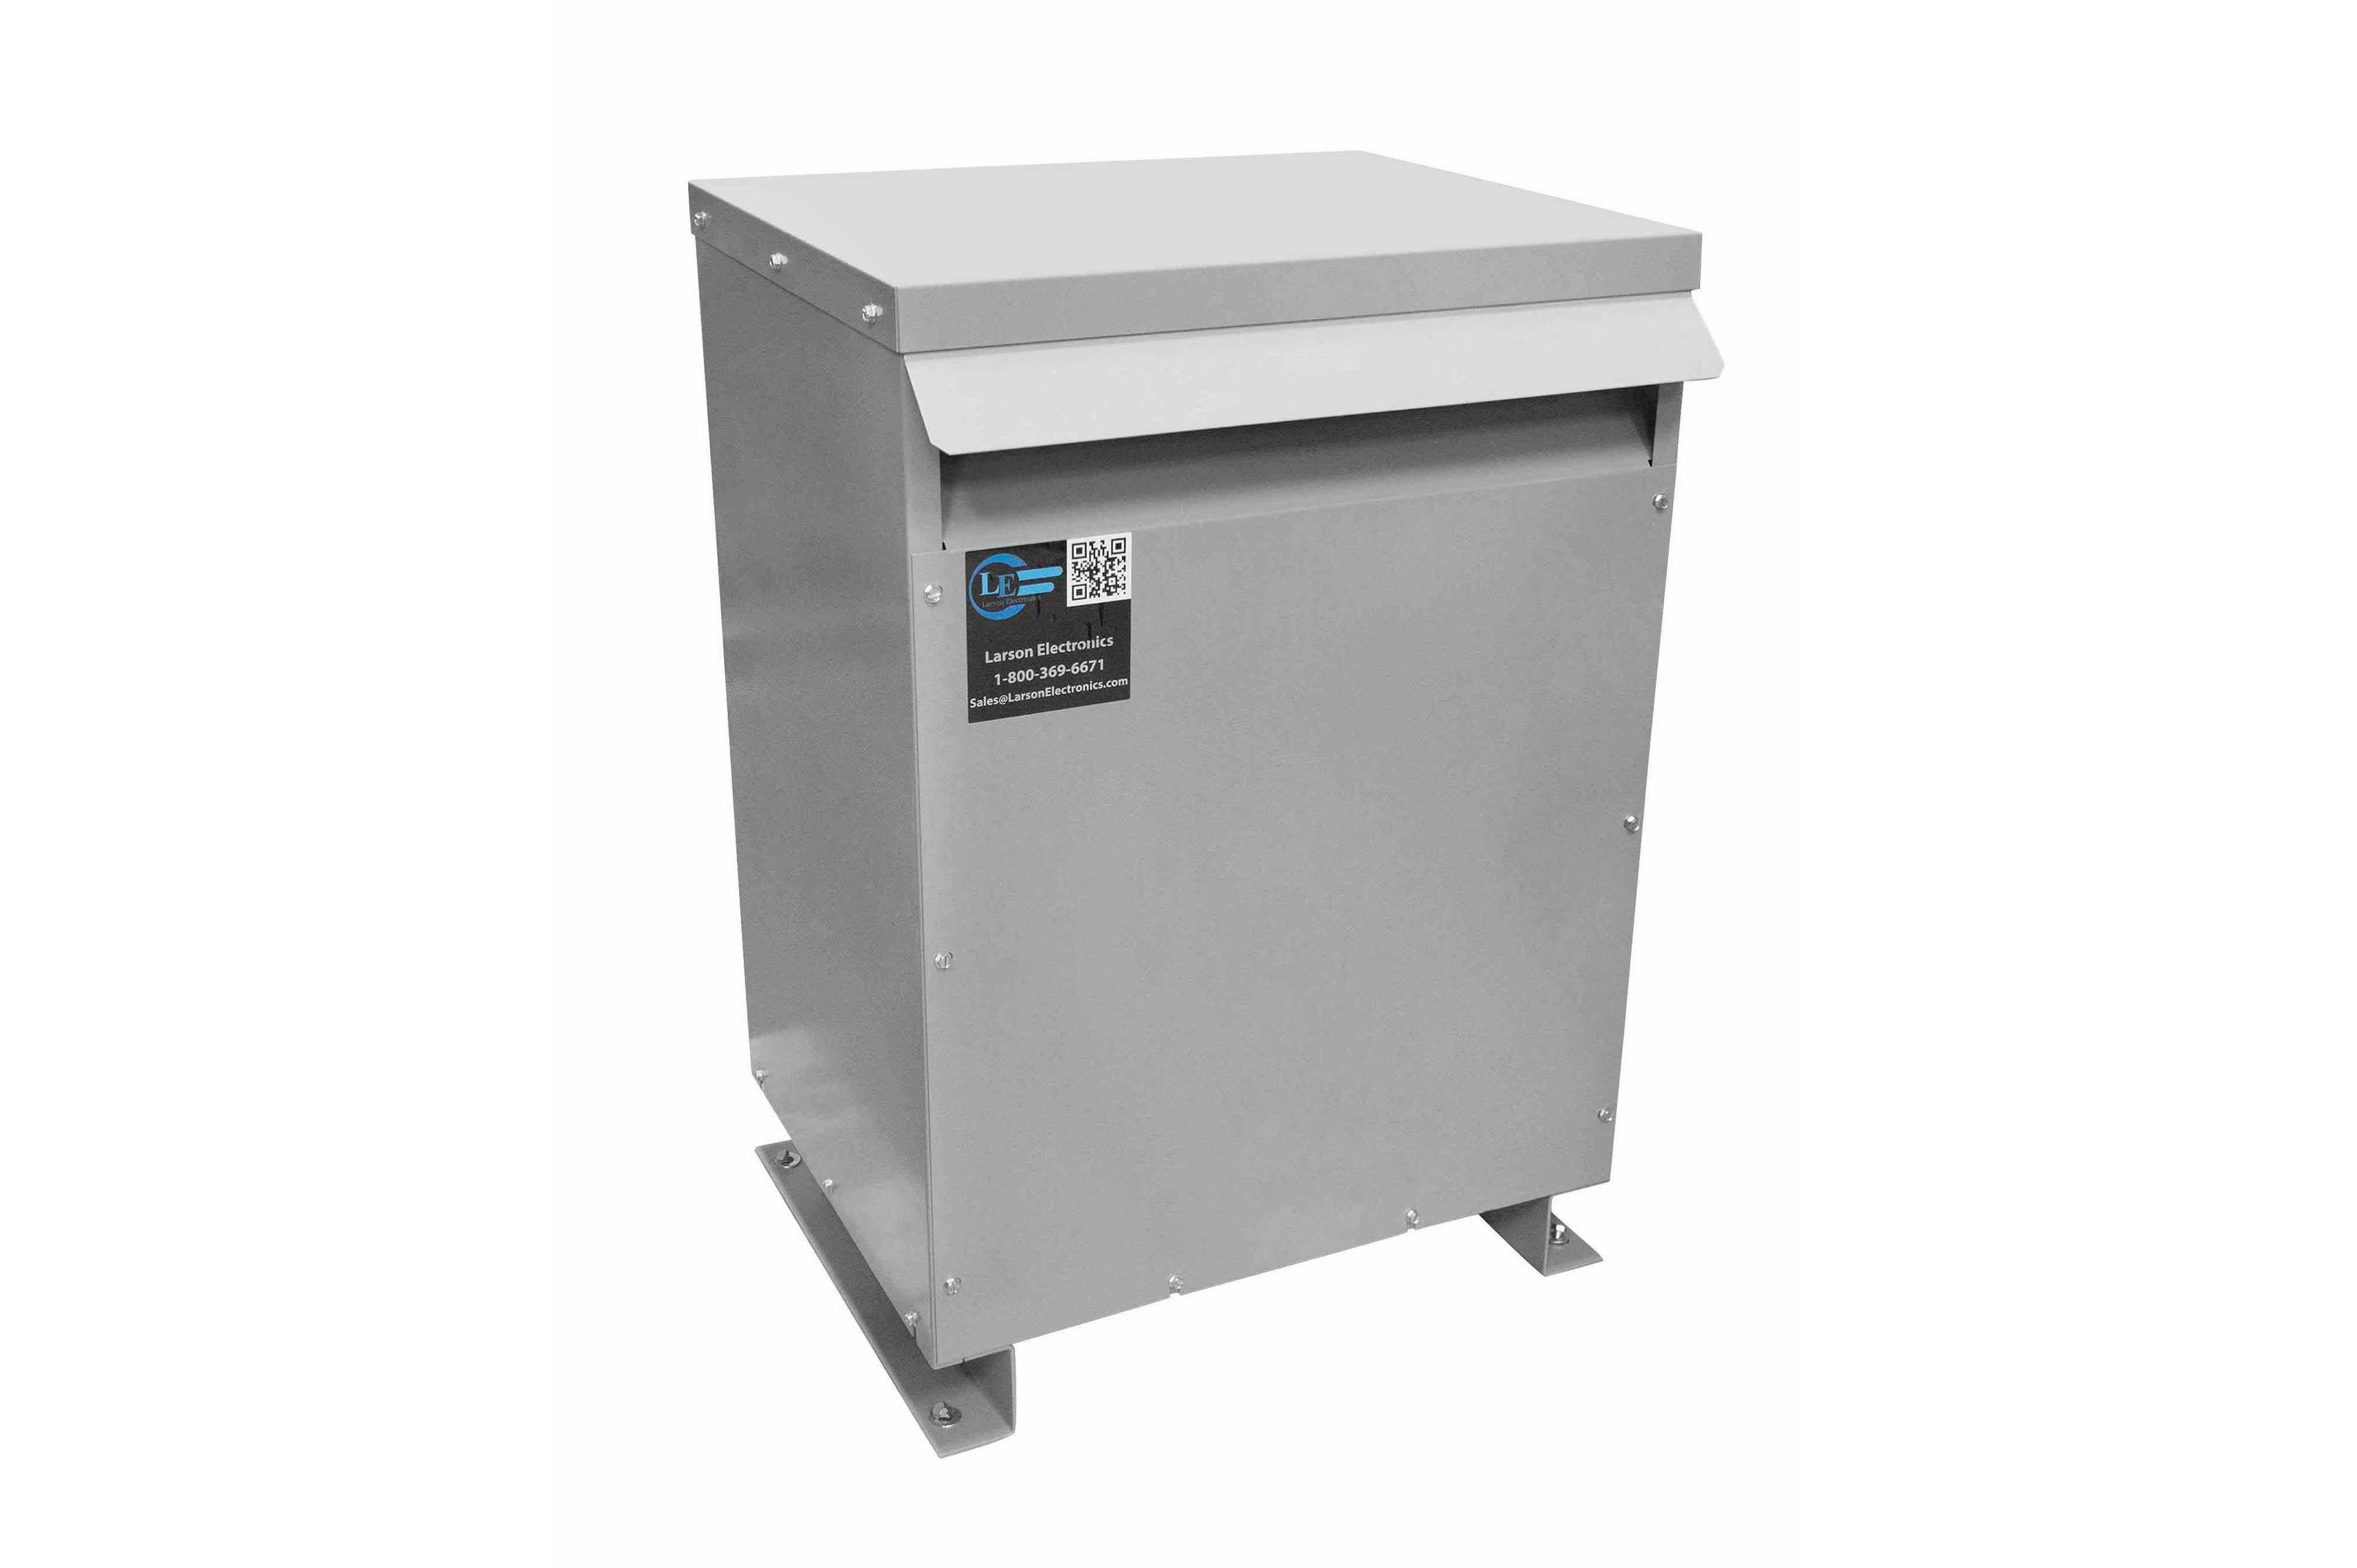 1000 kVA 3PH Isolation Transformer, 480V Wye Primary, 208Y/120 Wye-N Secondary, N3R, Ventilated, 60 Hz